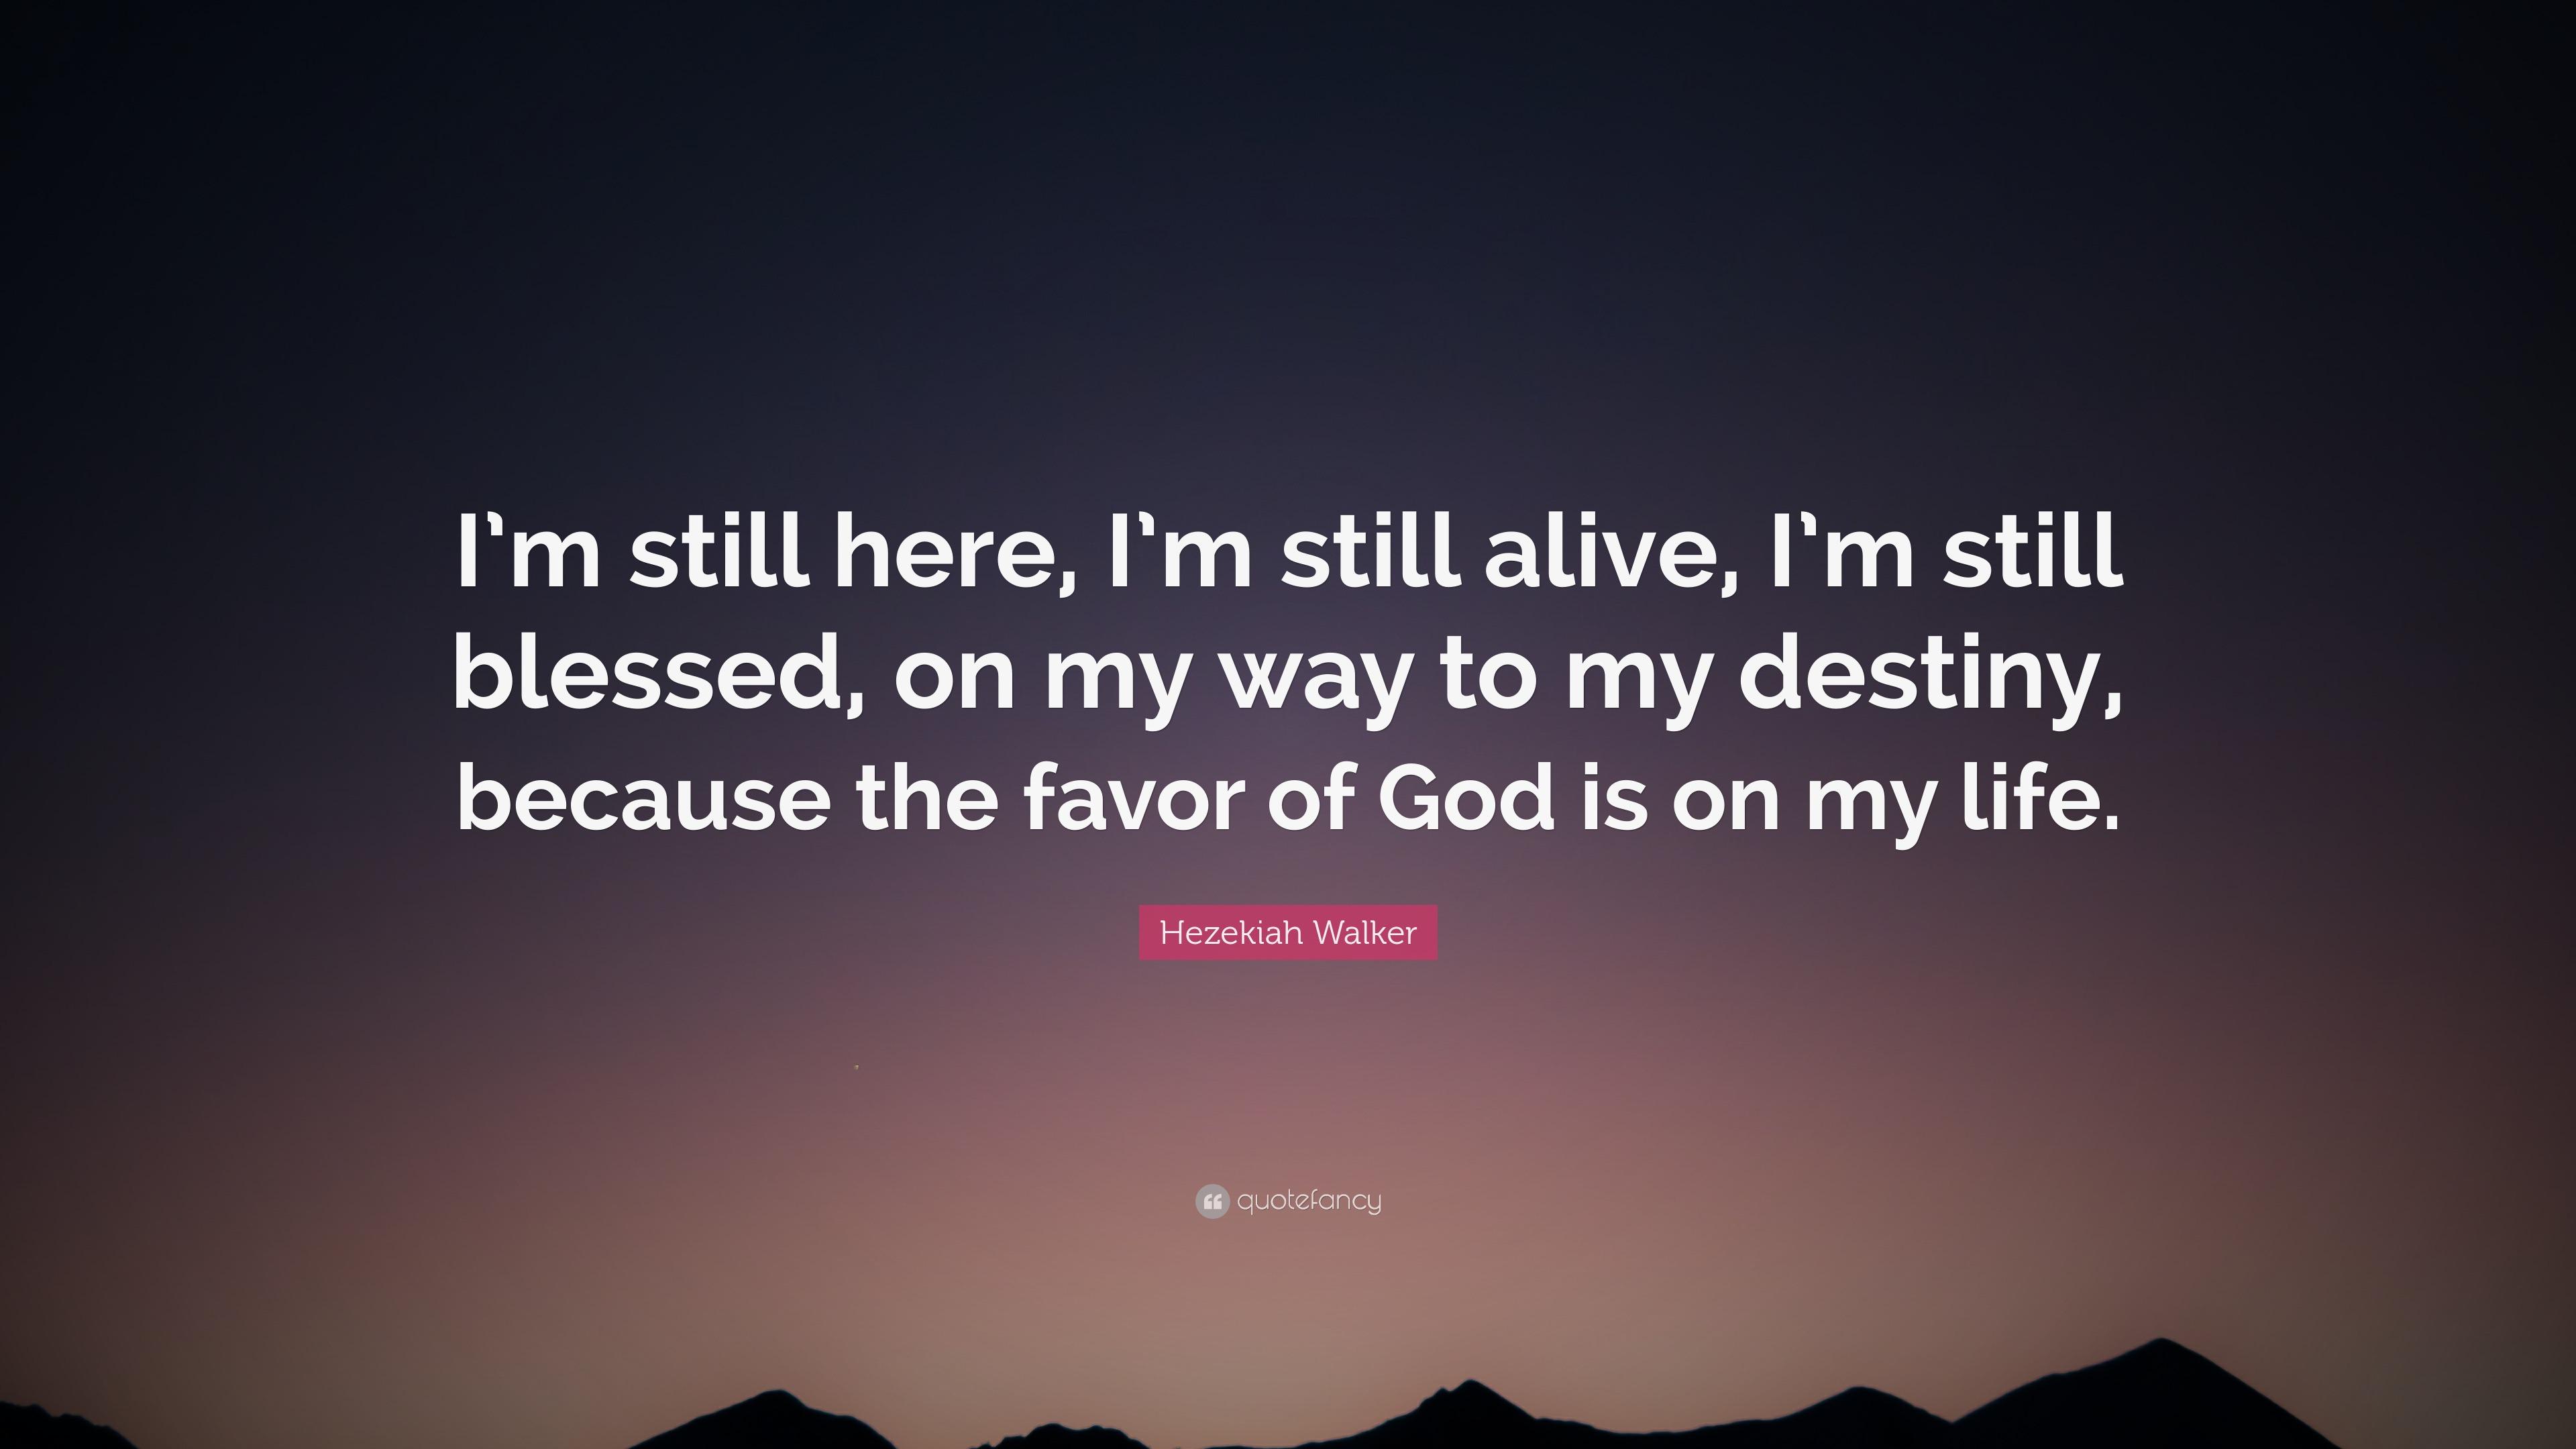 hezekiah walker quote u201ci m still here i m still alive i m still rh quotefancy com